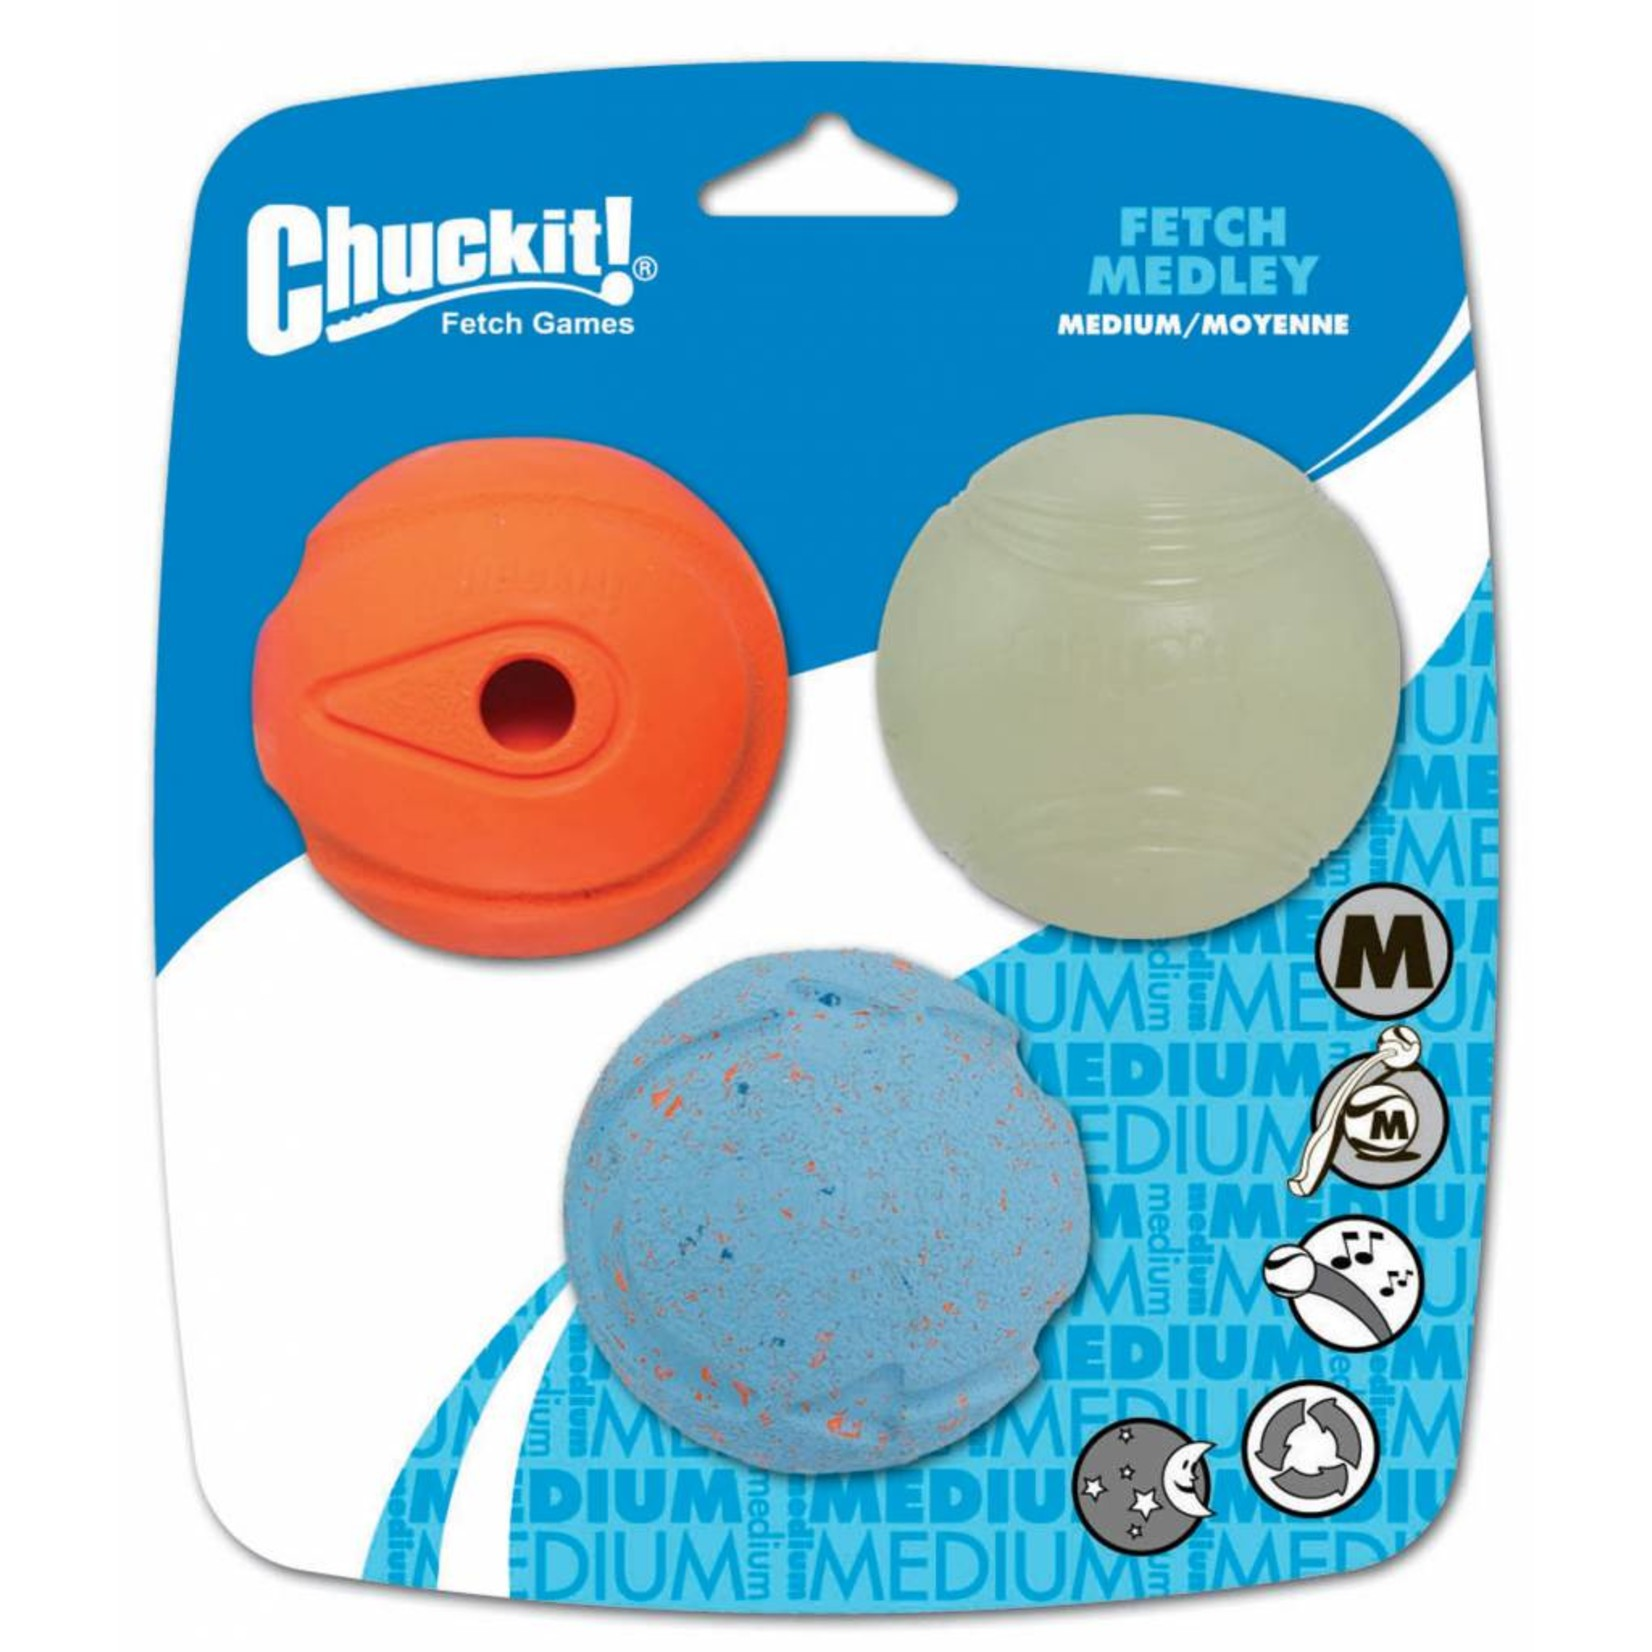 Chuckit! Fetch Medley Assorted Balls Dog Toy Medium 6.5cm, 3 pack